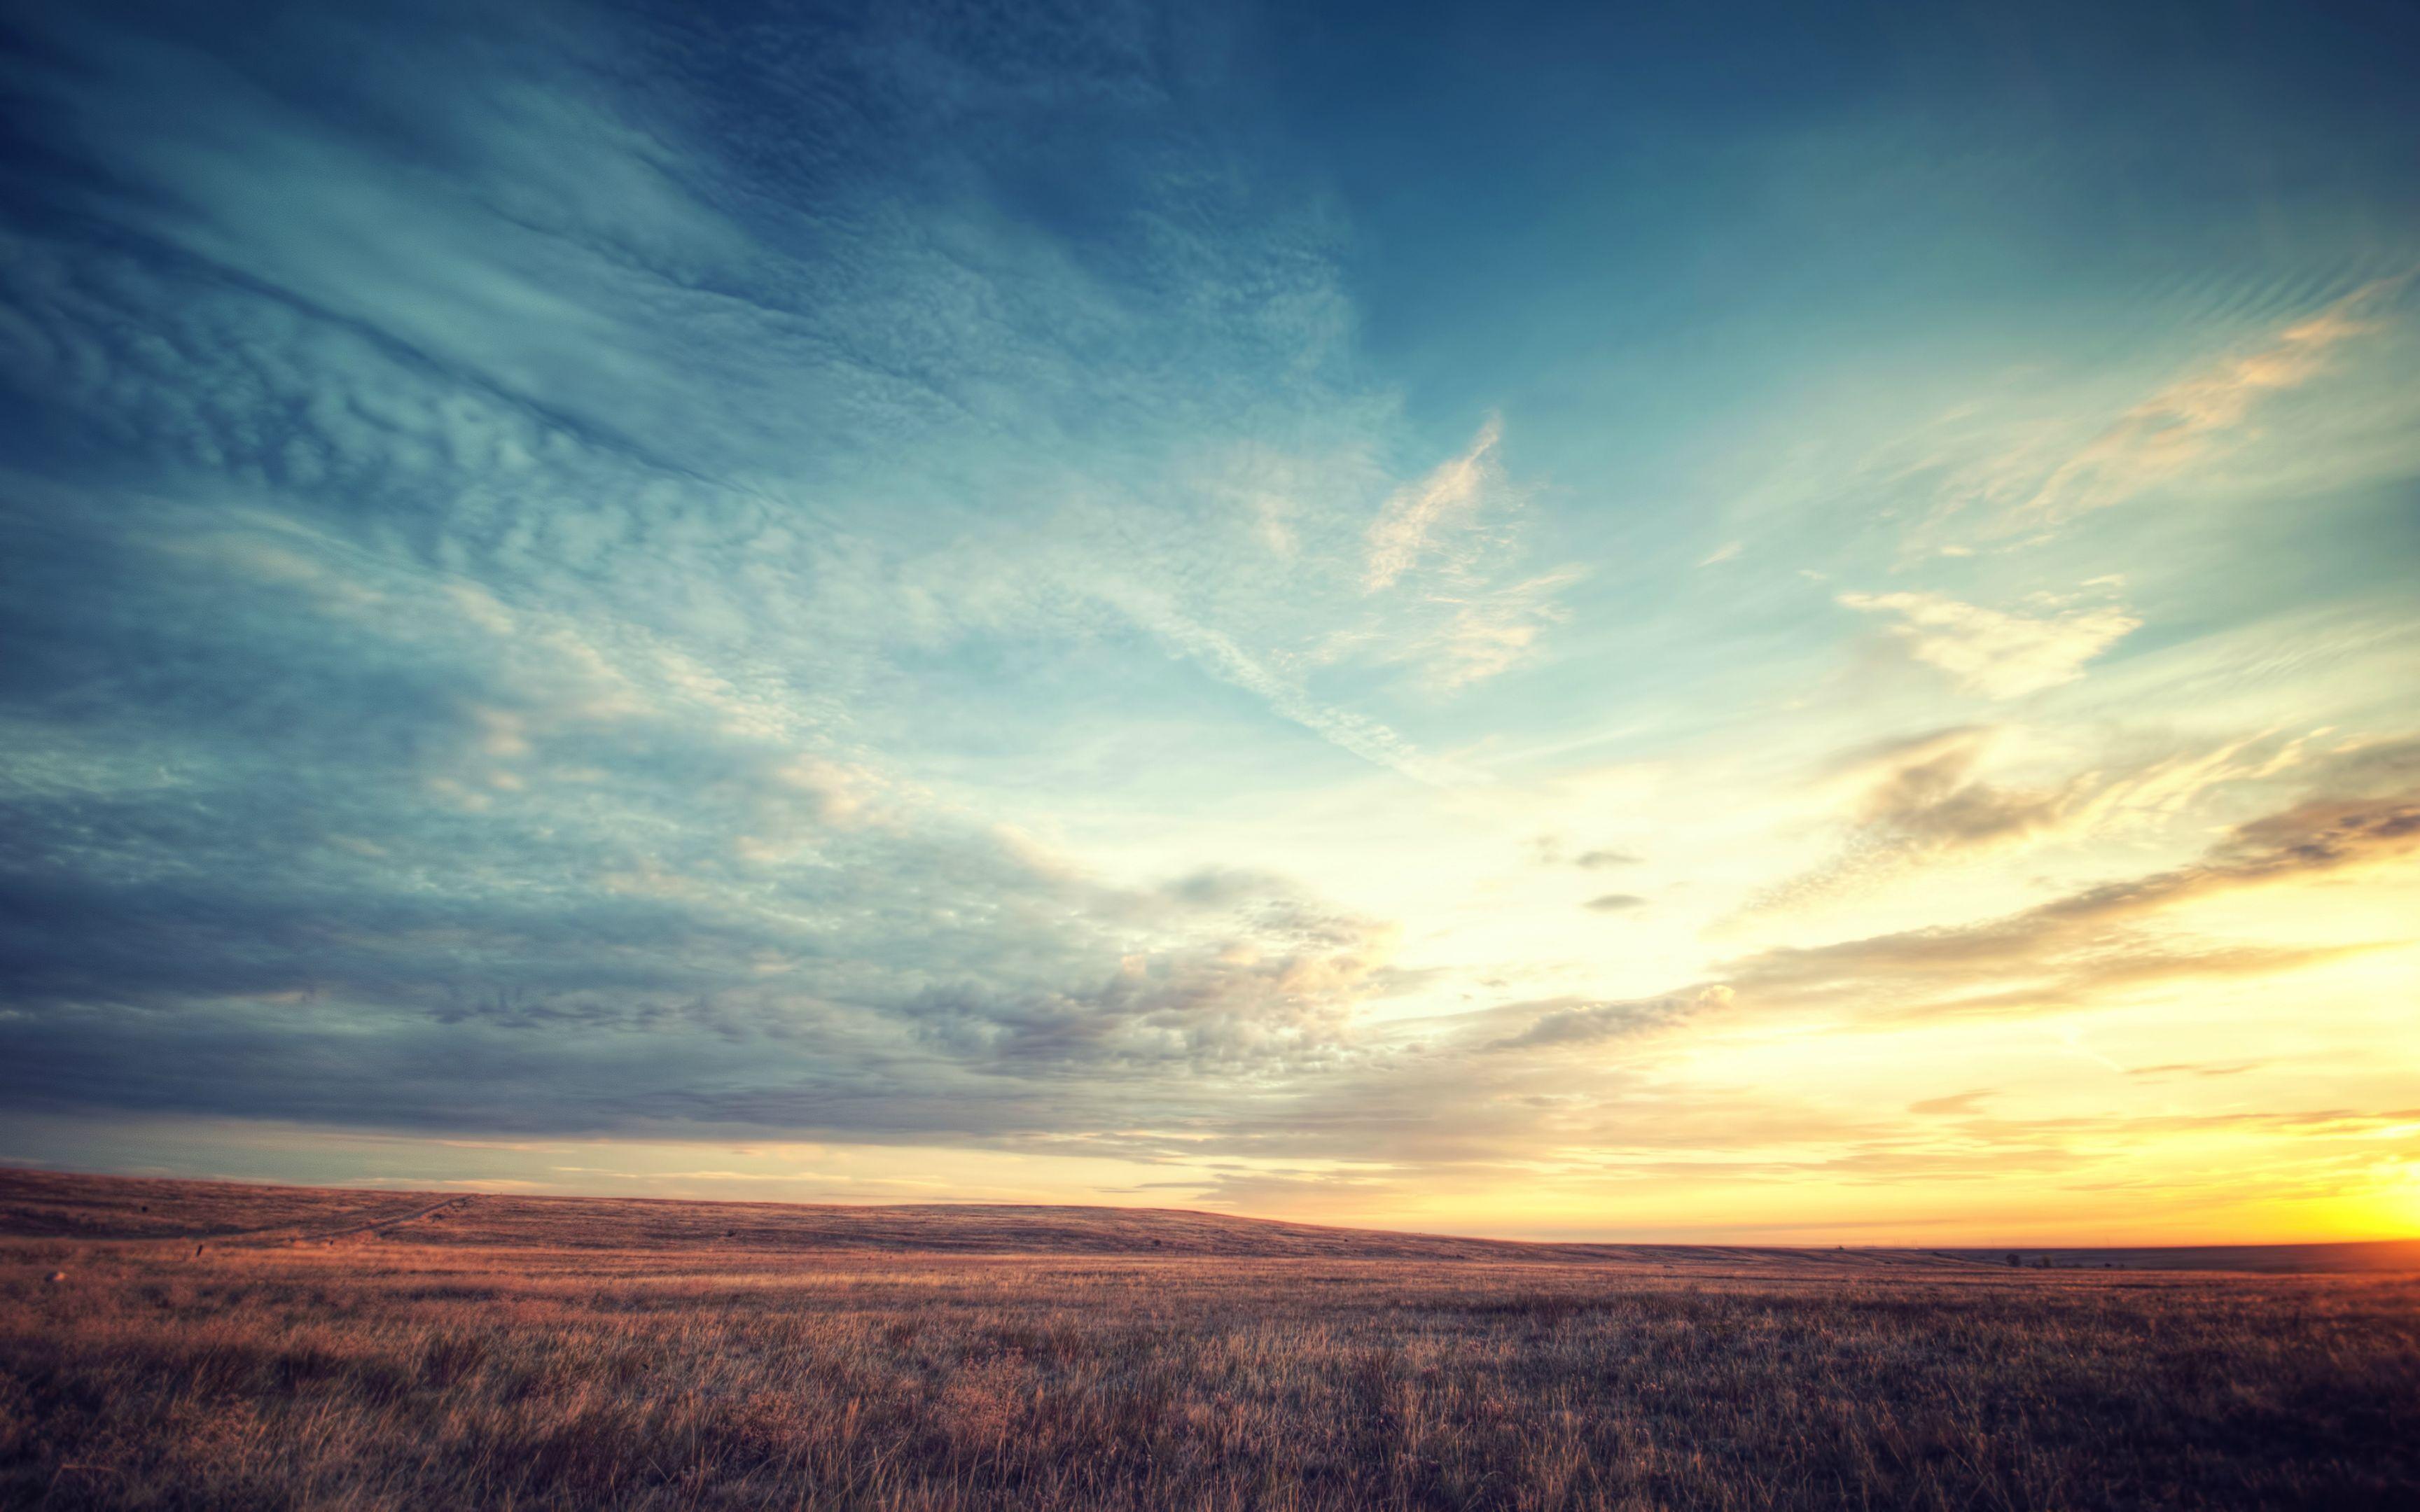 природа горизонт небо облака деревья солнце nature horizon the sky clouds trees sun бесплатно